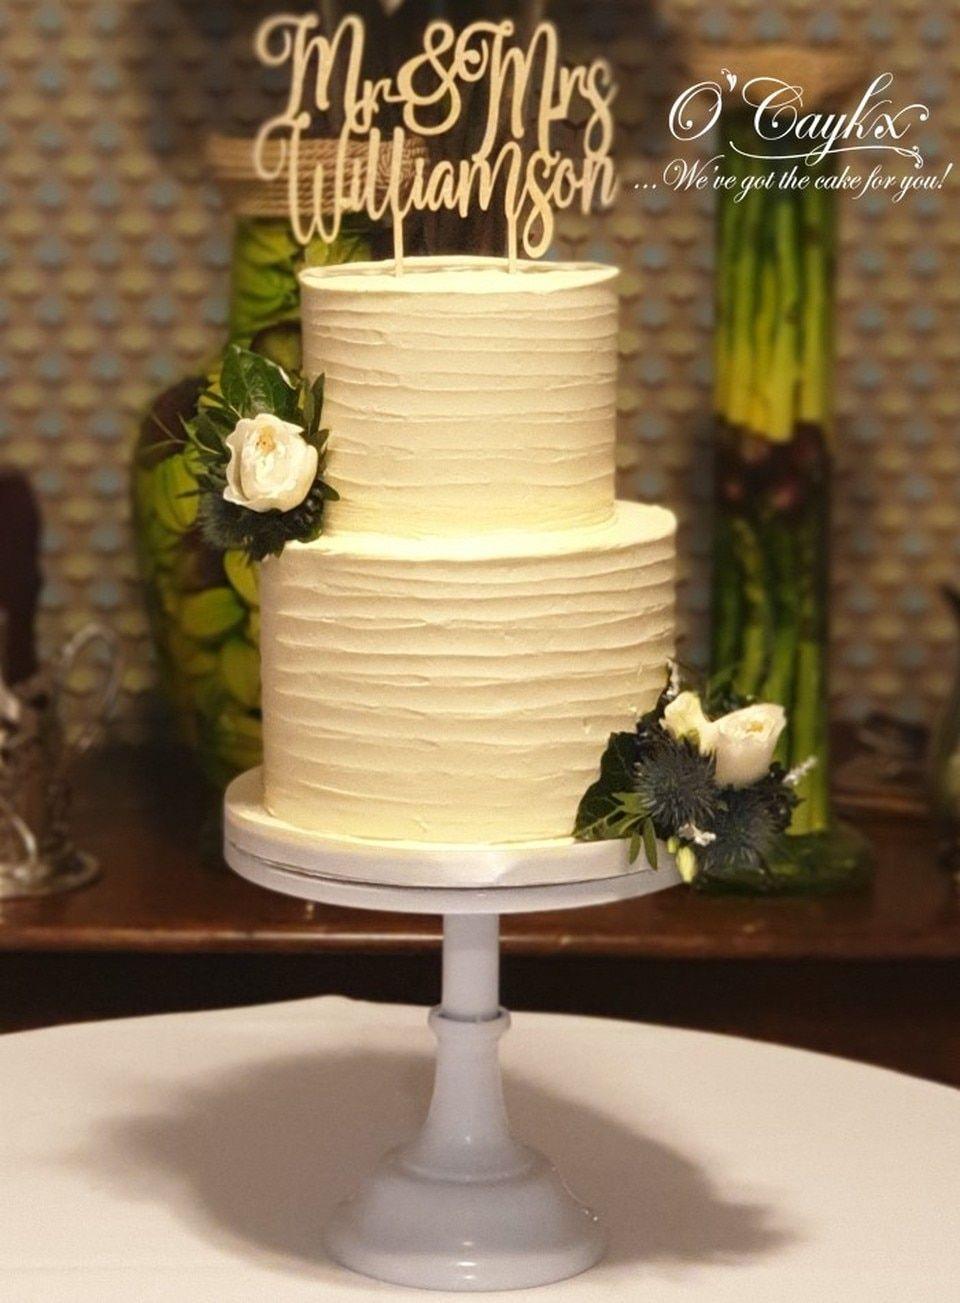 2 Tier Rustic Buttercream Wedding Cake WC00199 in 2020